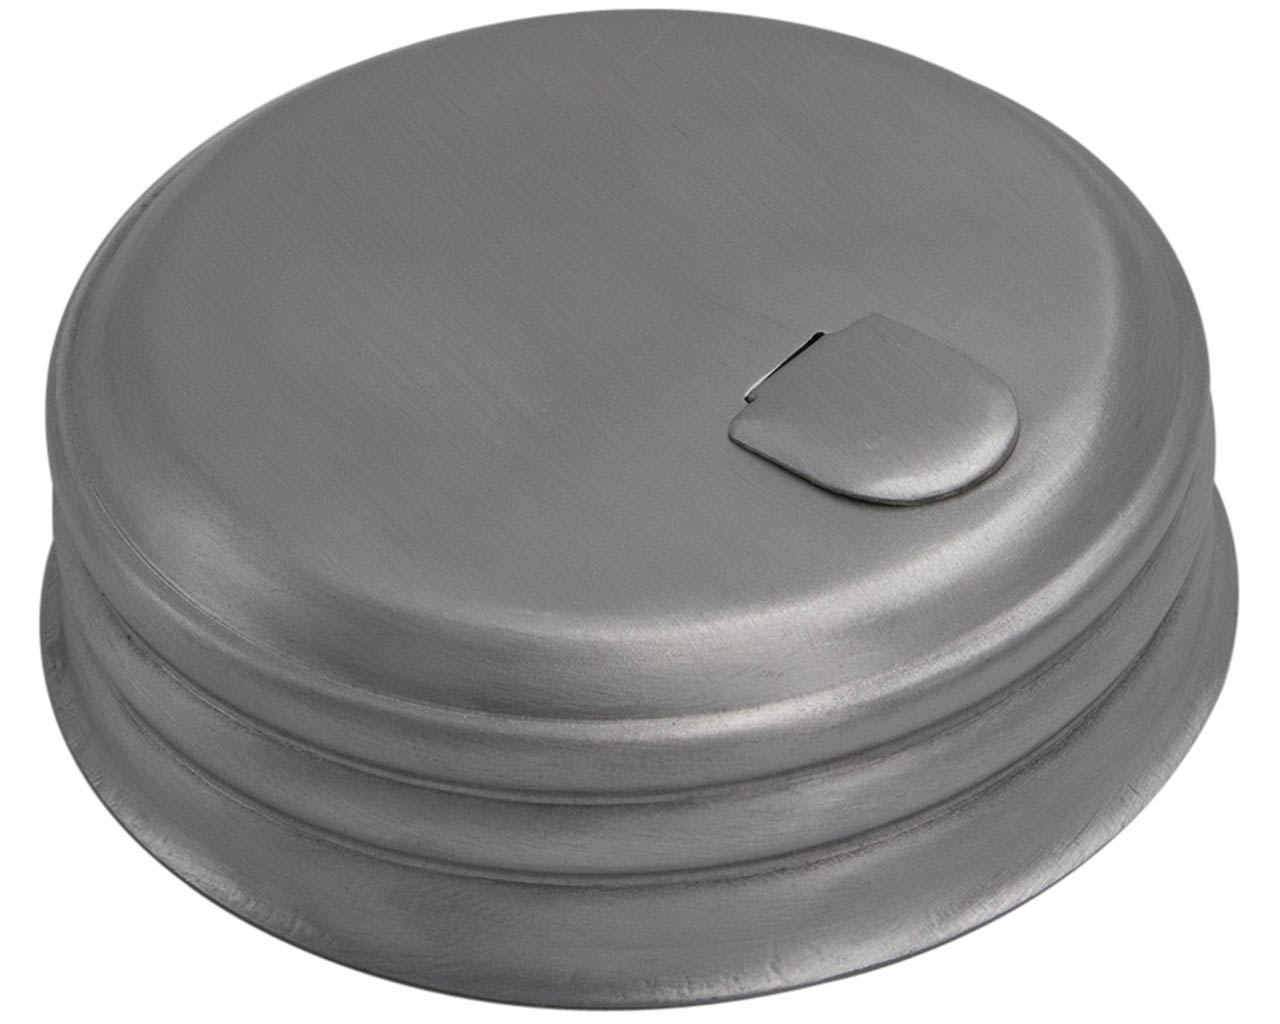 sugar-pour-lid-regular-mouth-mason-jars-flap-aluminum-closed